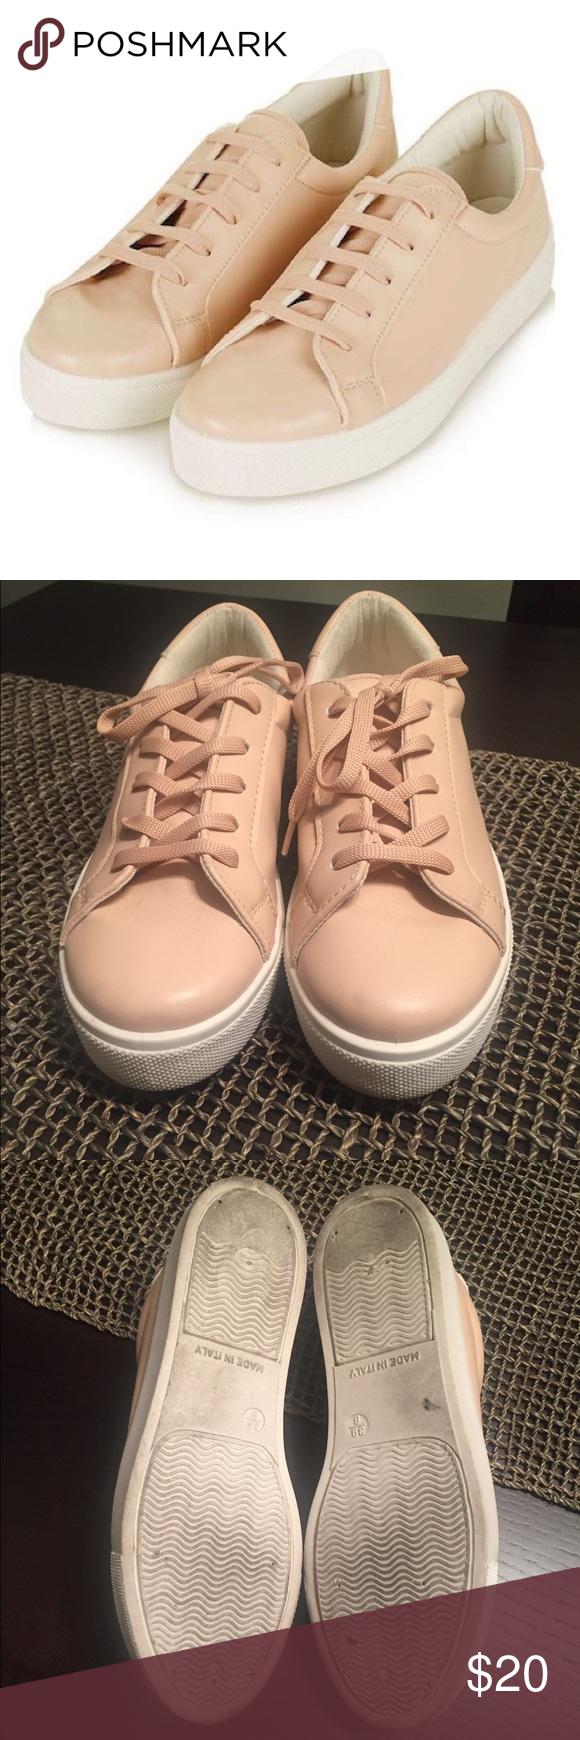 Topshop Blush platform sneakers Blush color topshop faux leather sneakers Topshop Shoes Sneakers